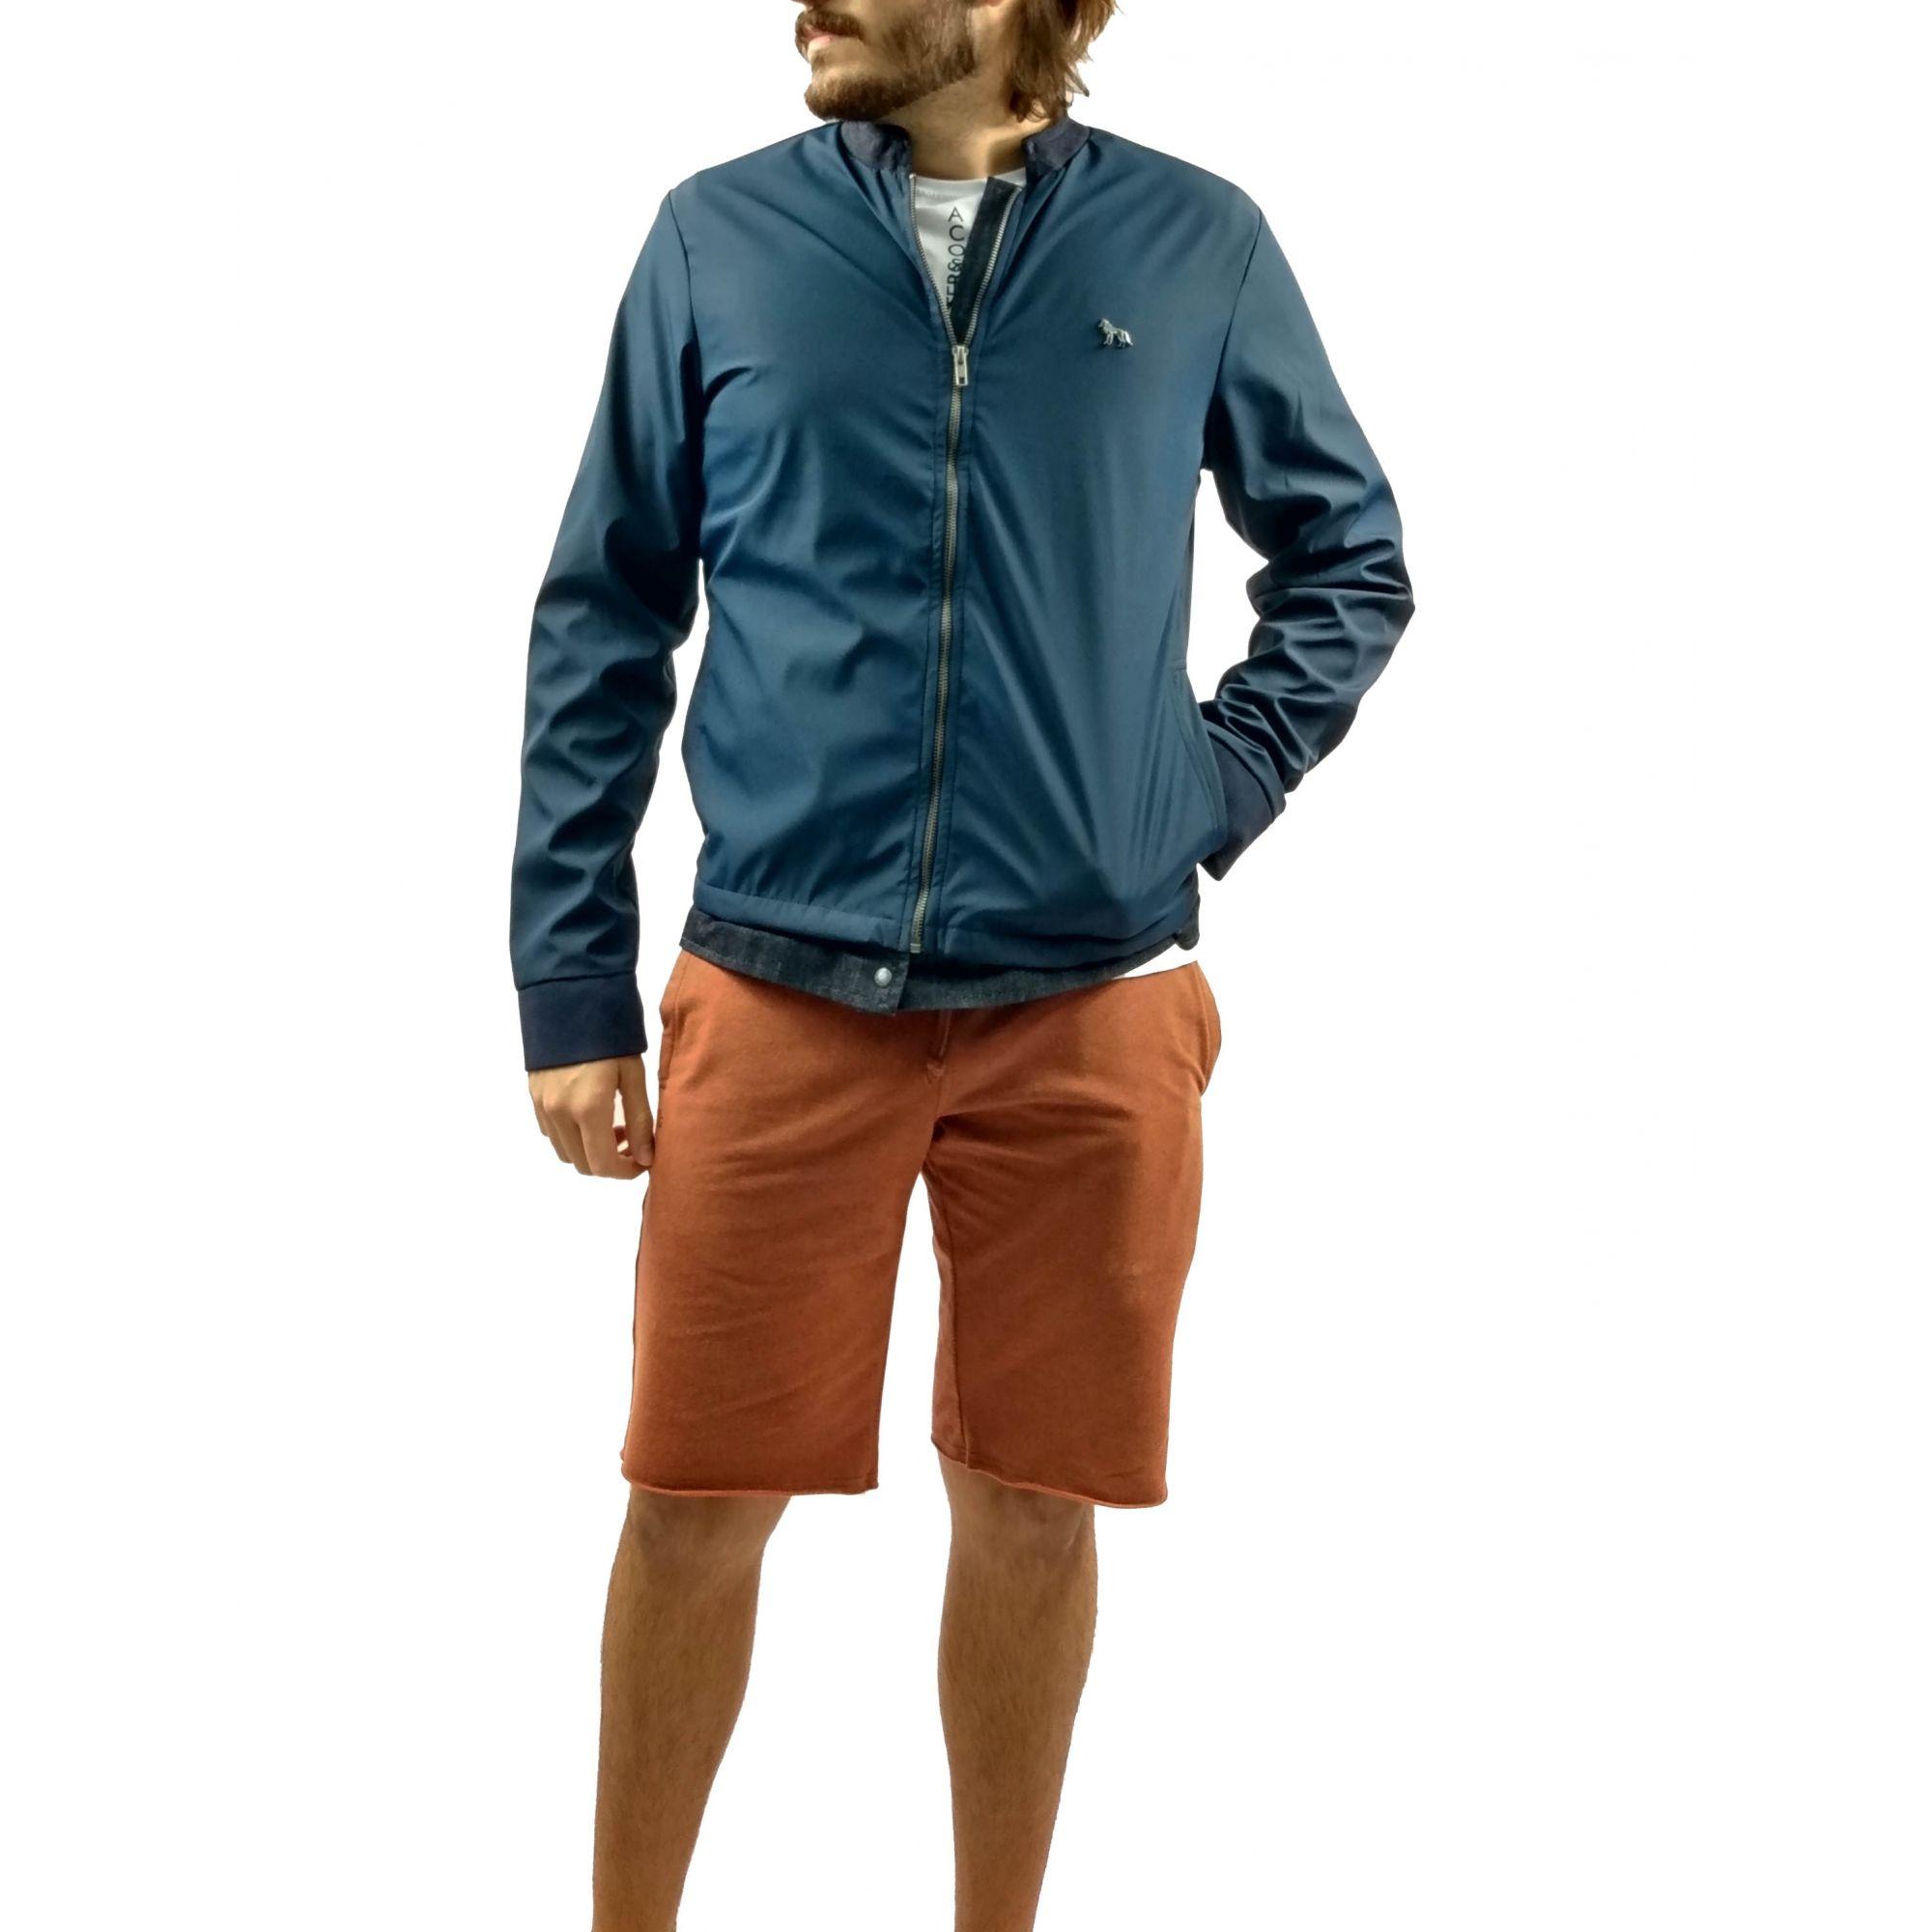 Jaqueta Masculina Acostamento Azul Marinho